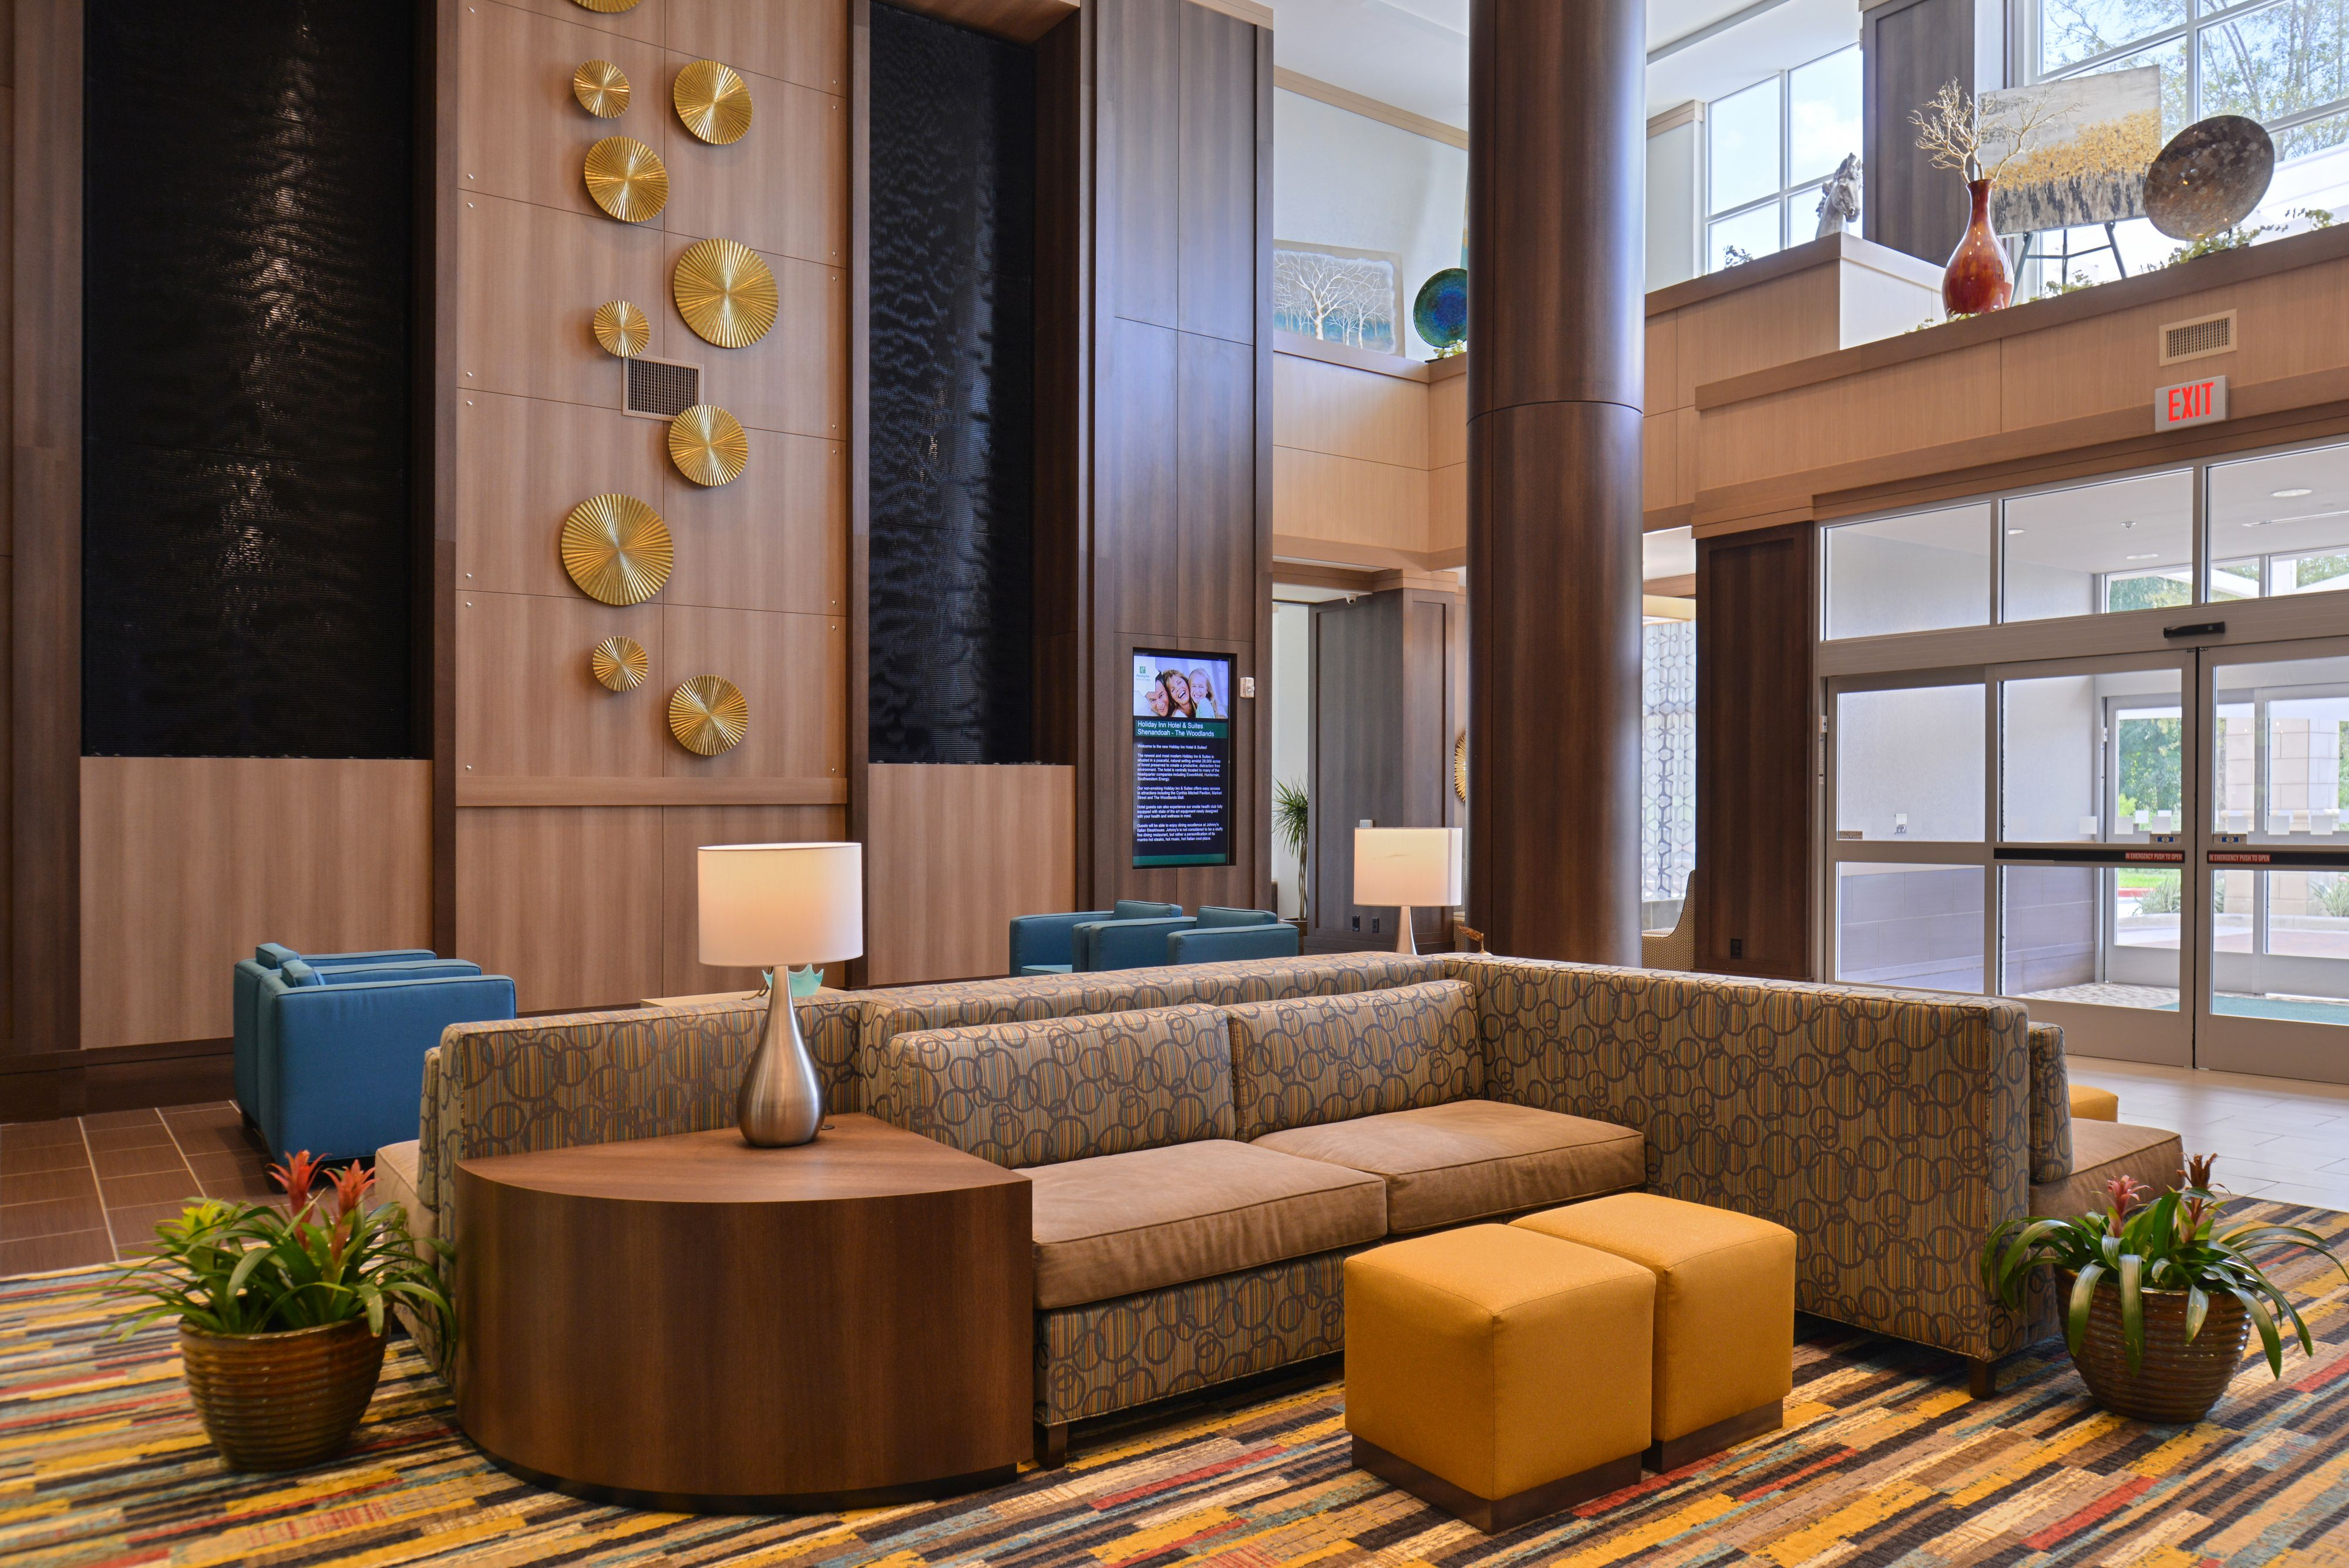 Holiday Inn Hotel And Suites Shenandoah Shenandoah Tx